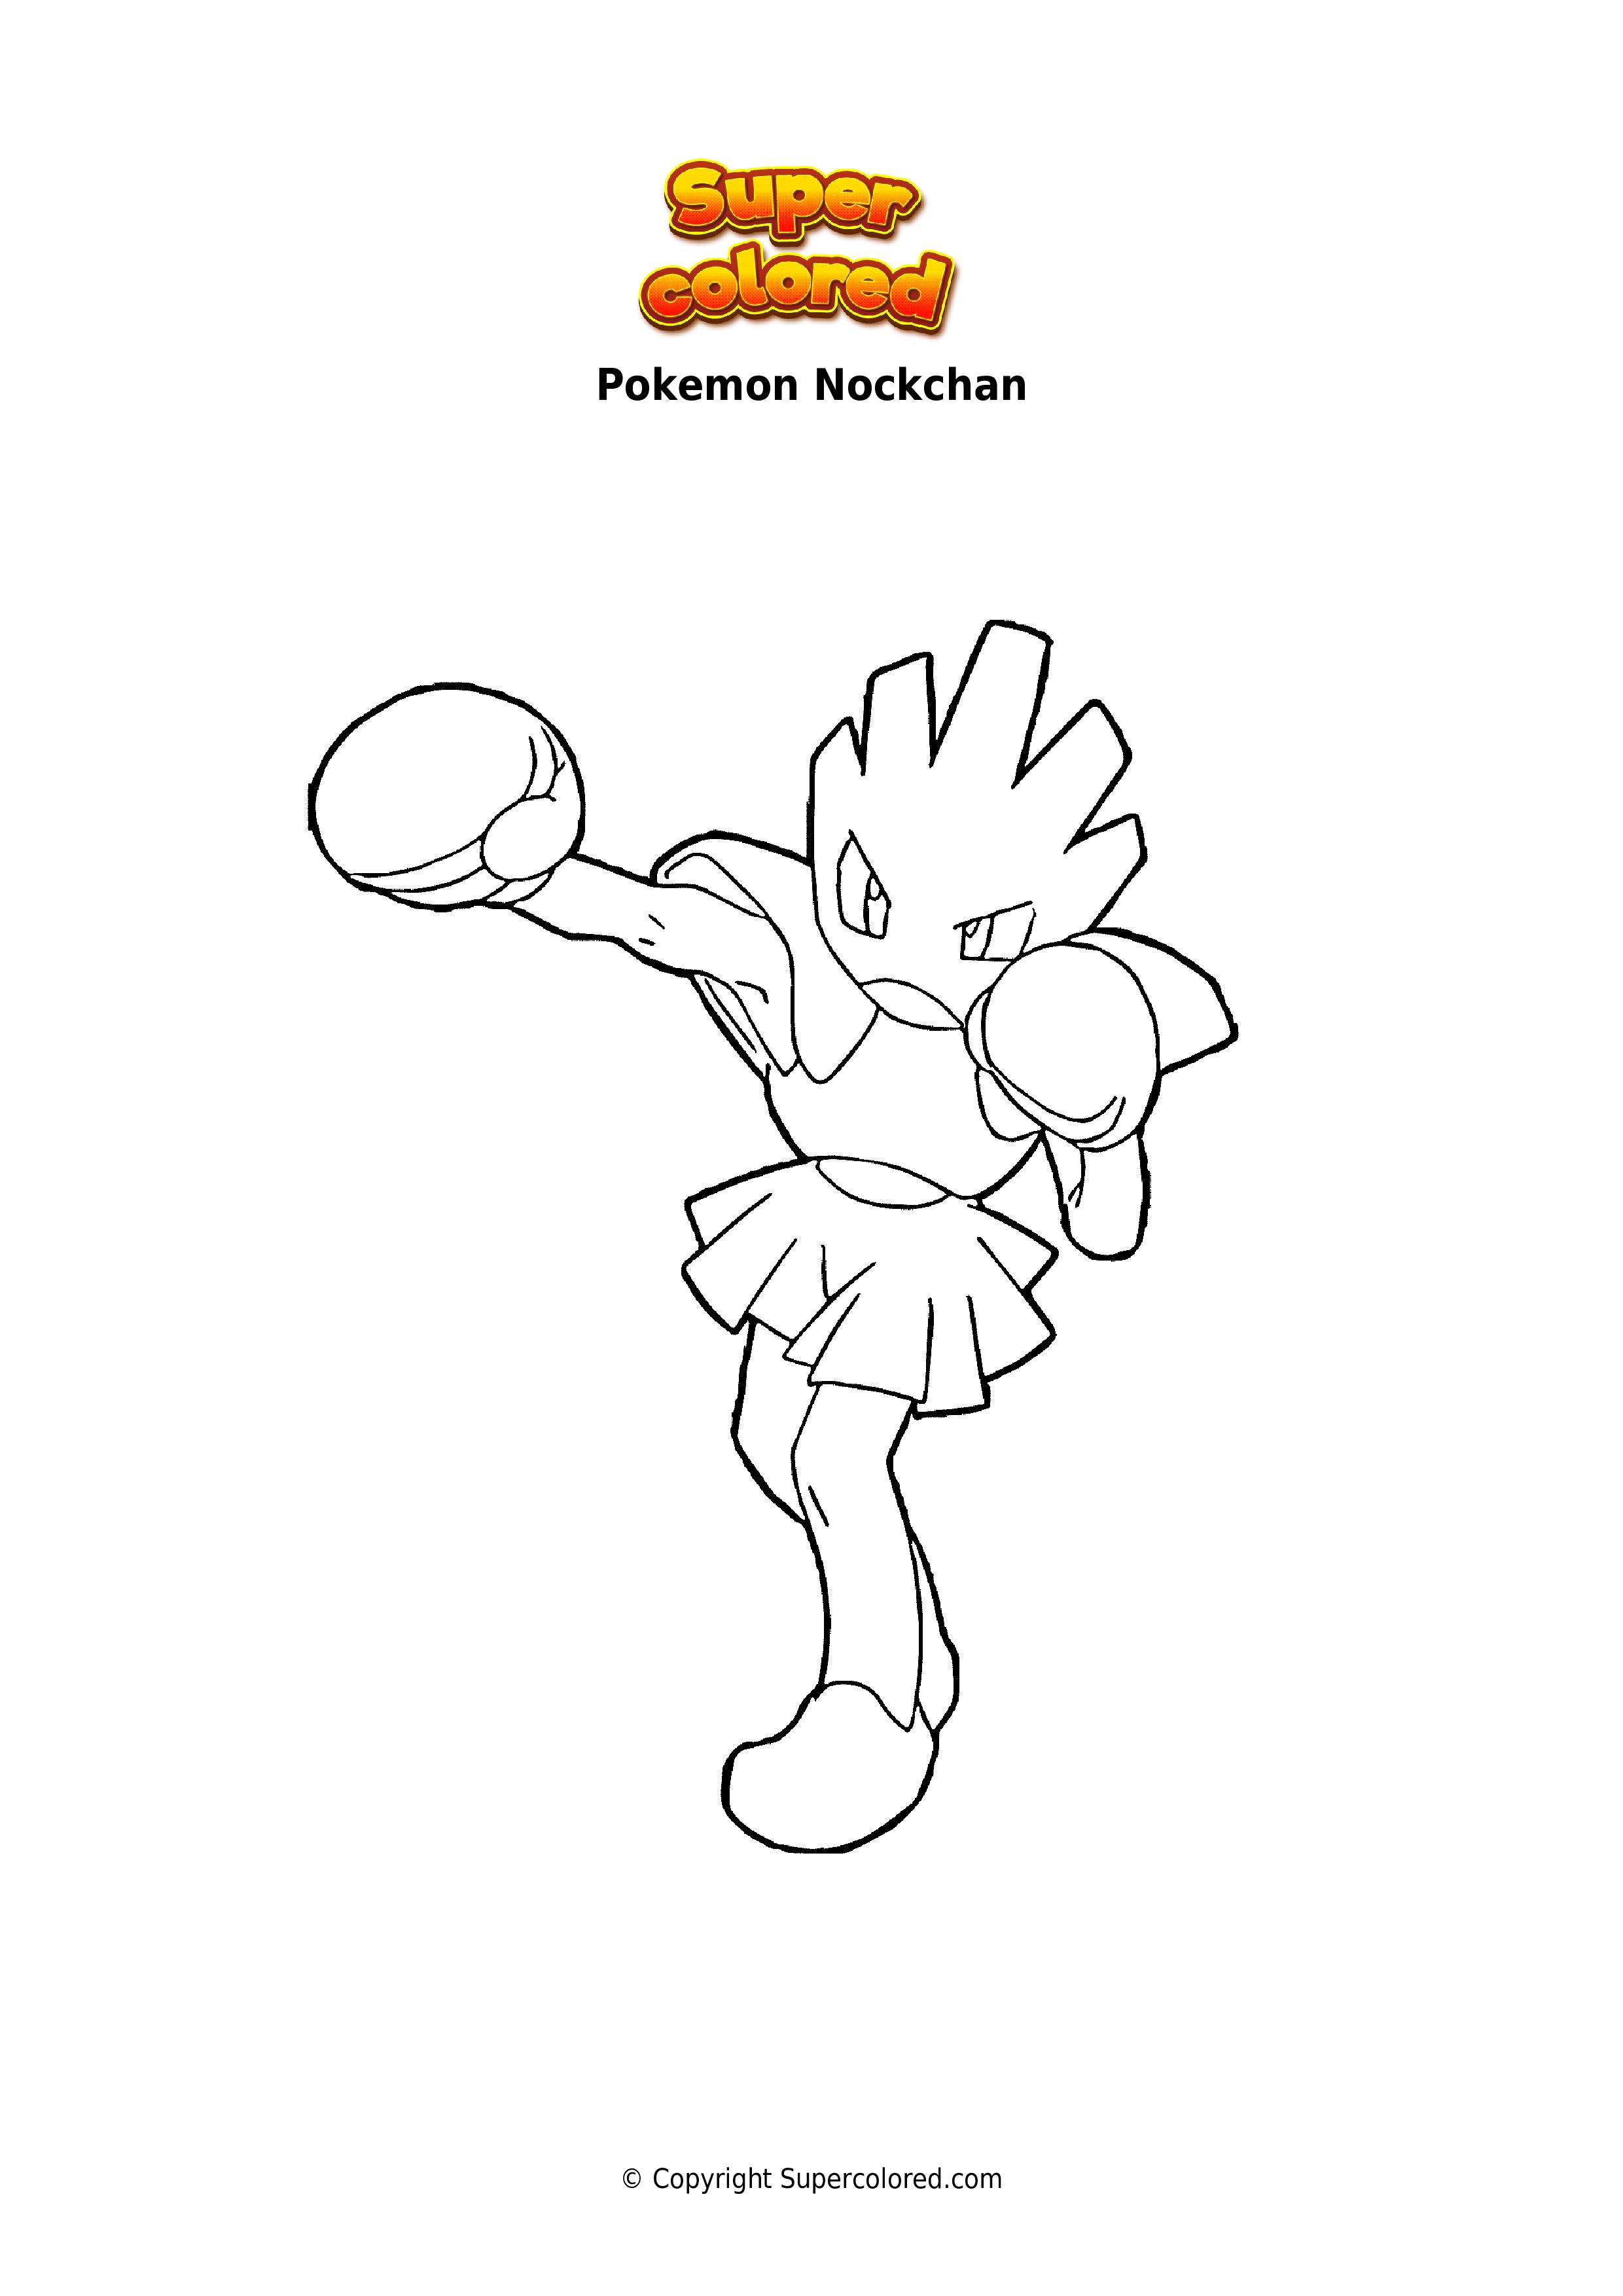 Ausmalbild Pokemon Nockchan - Supercolored.com